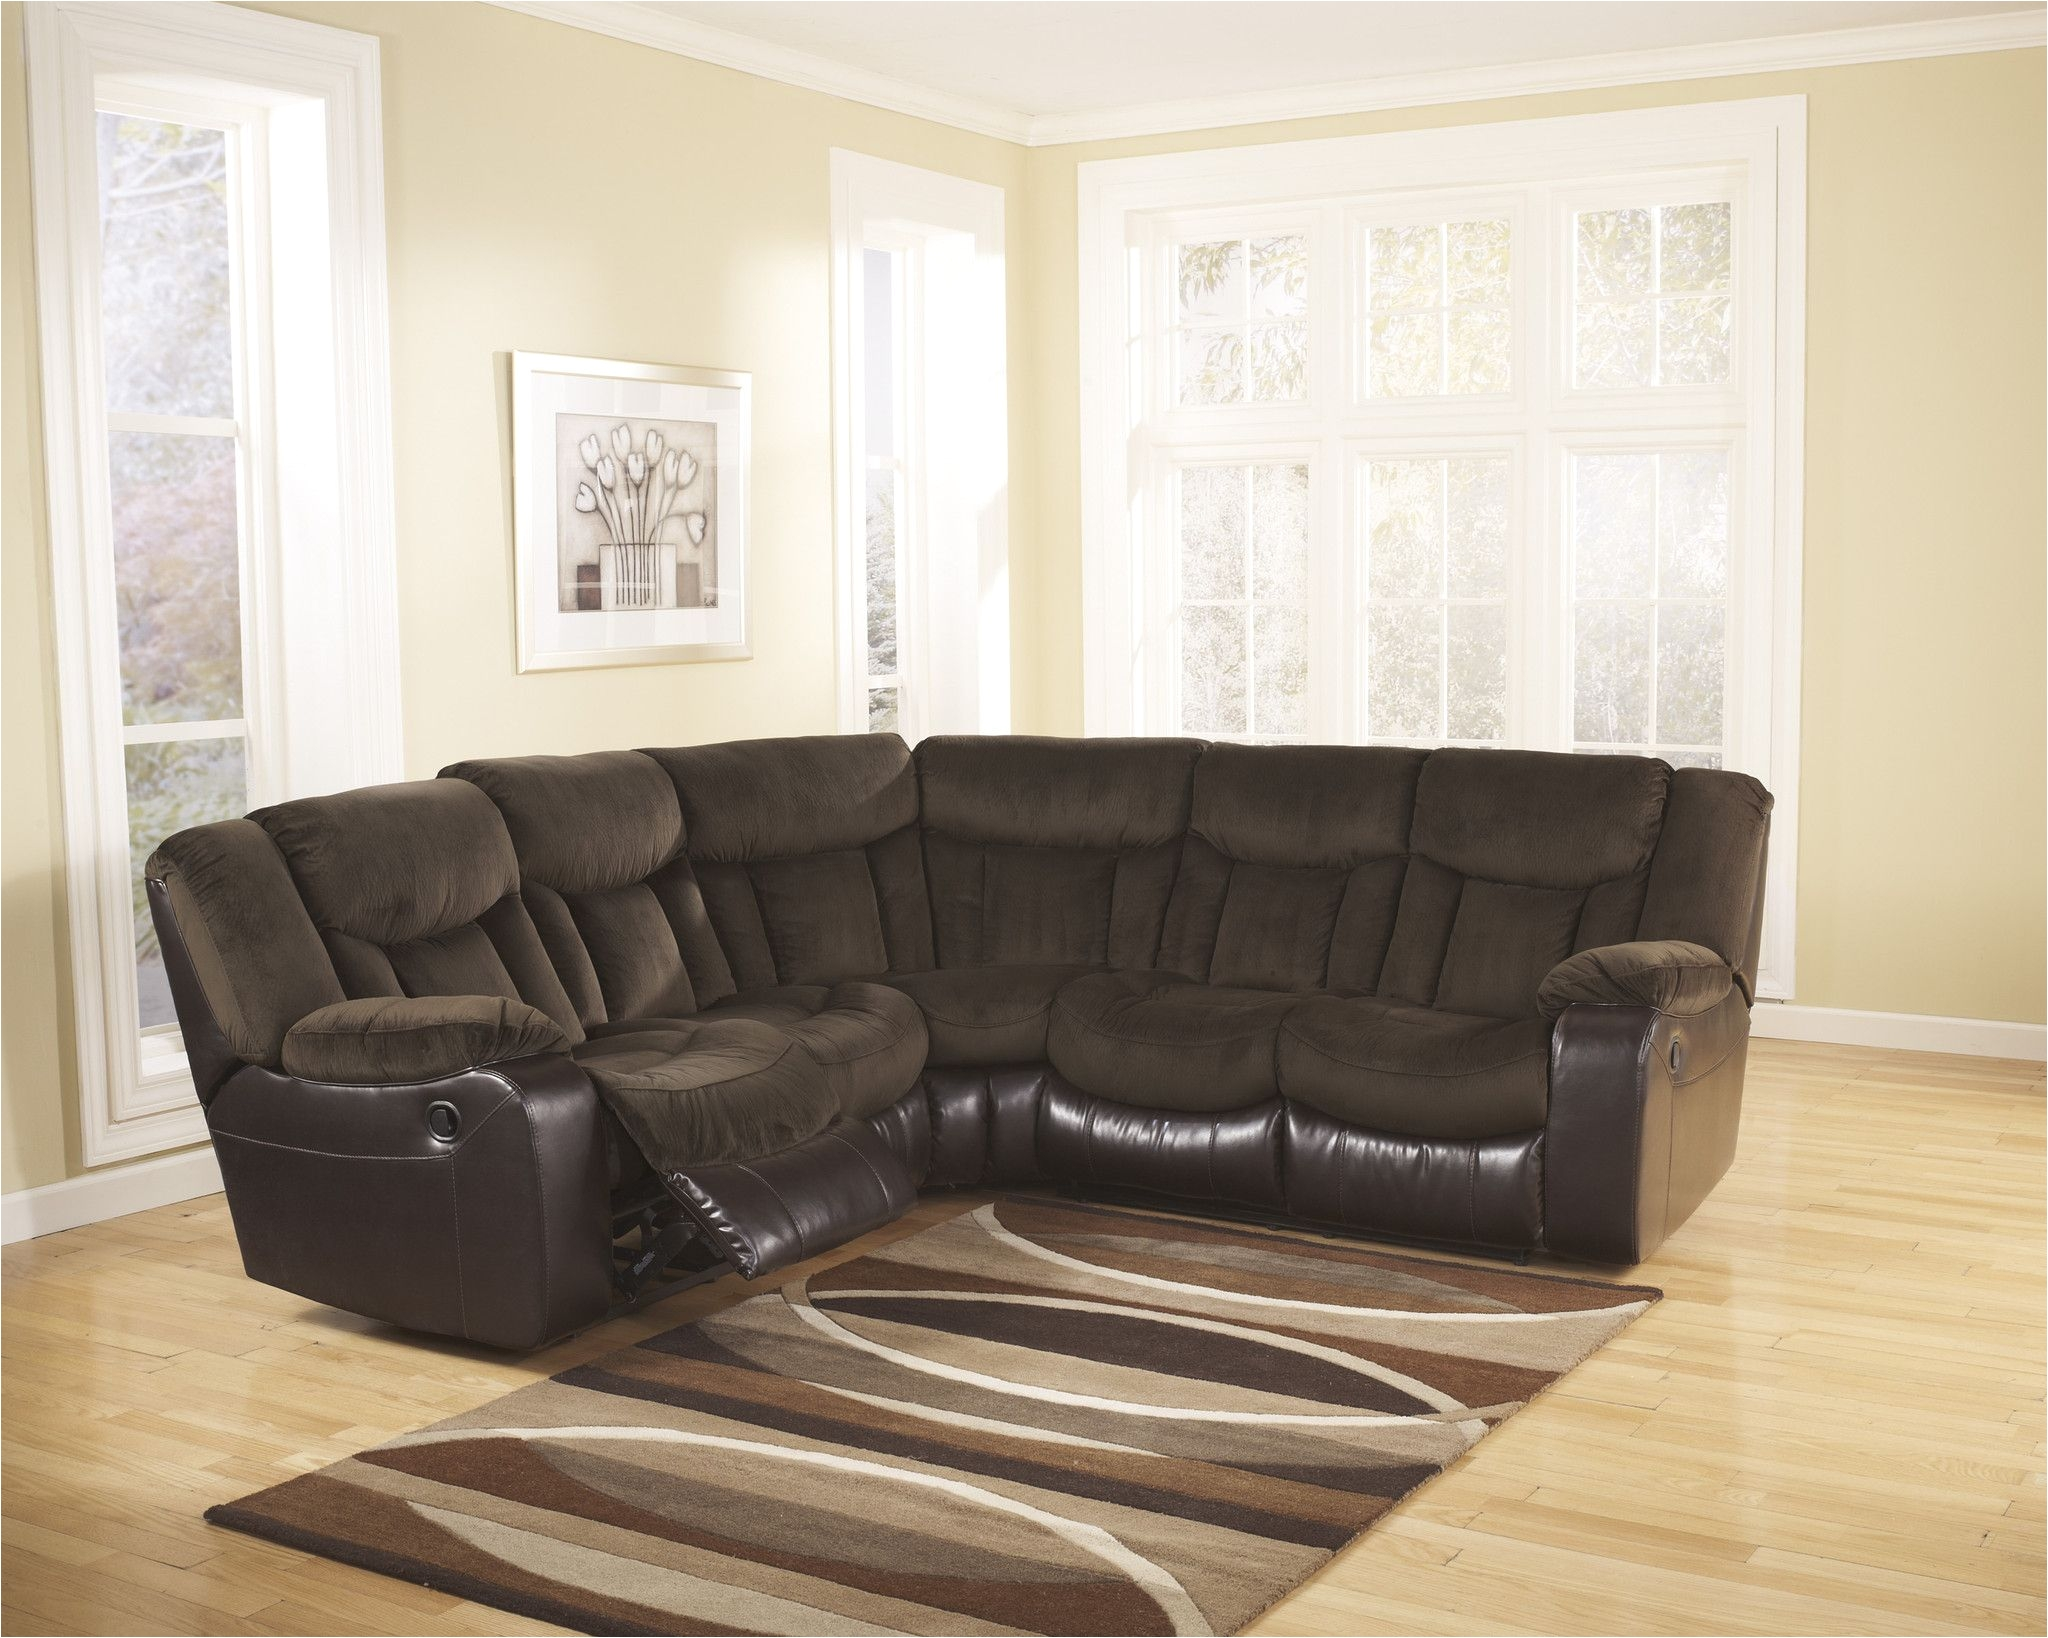 ashley furniture tafton reclining sectional 792024849